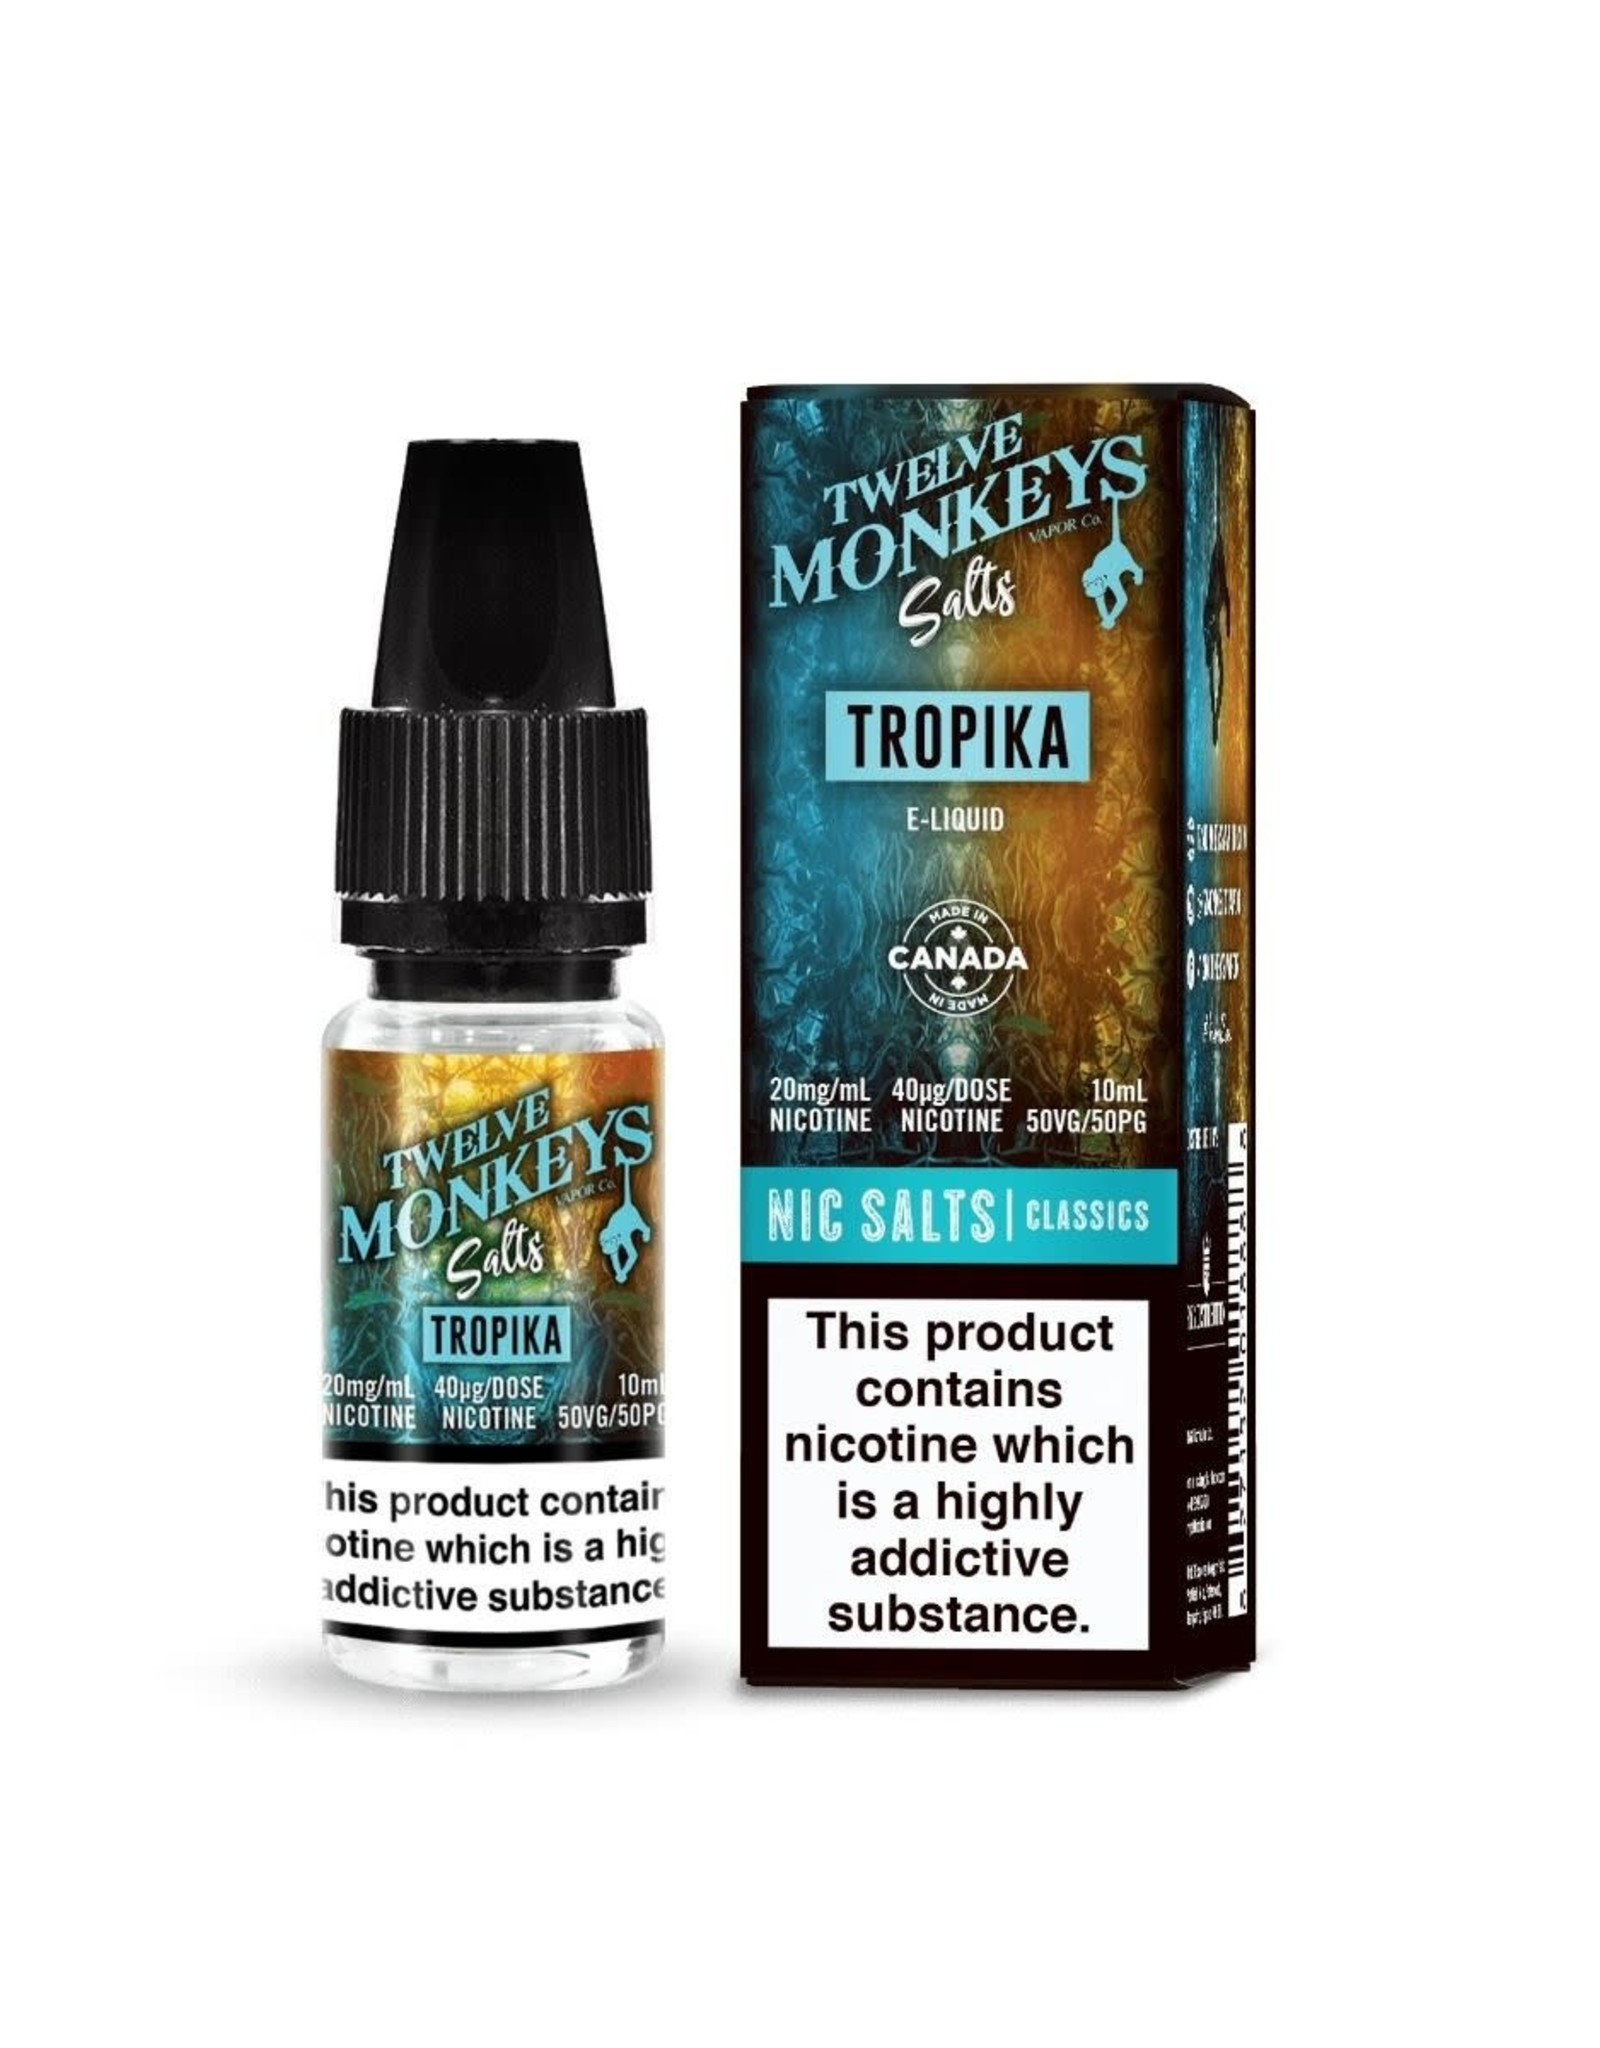 12 Monkeys Twelve Monkeys - Tropika 10ml 20mg